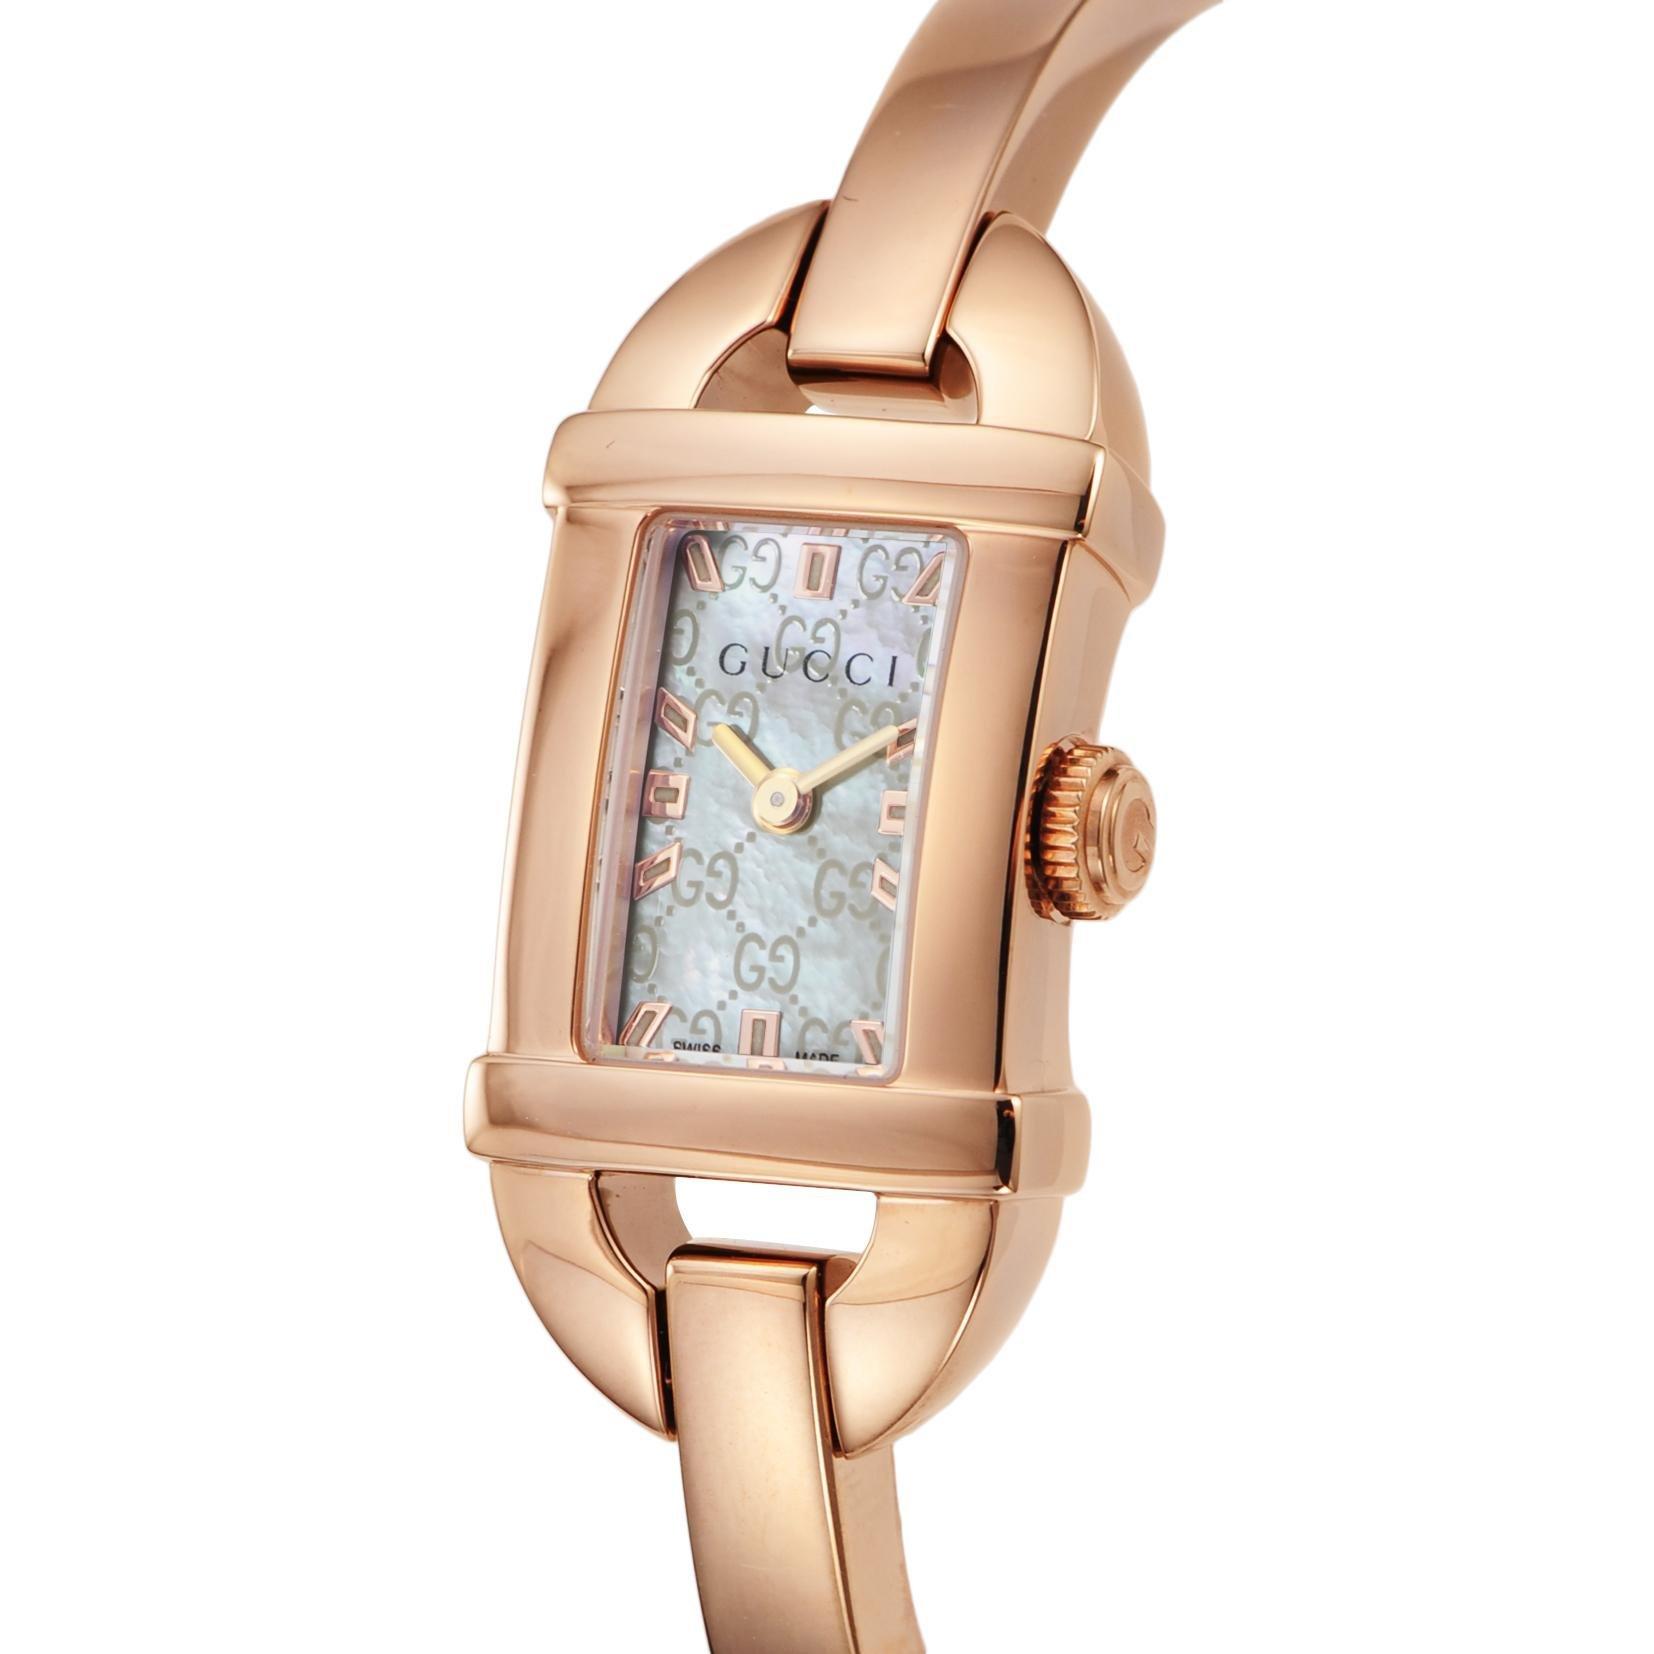 15a268bb8025 Amazon | [グッチ]GUCCI 腕時計 6800 ホワイトパール文字盤 ステンレス ...